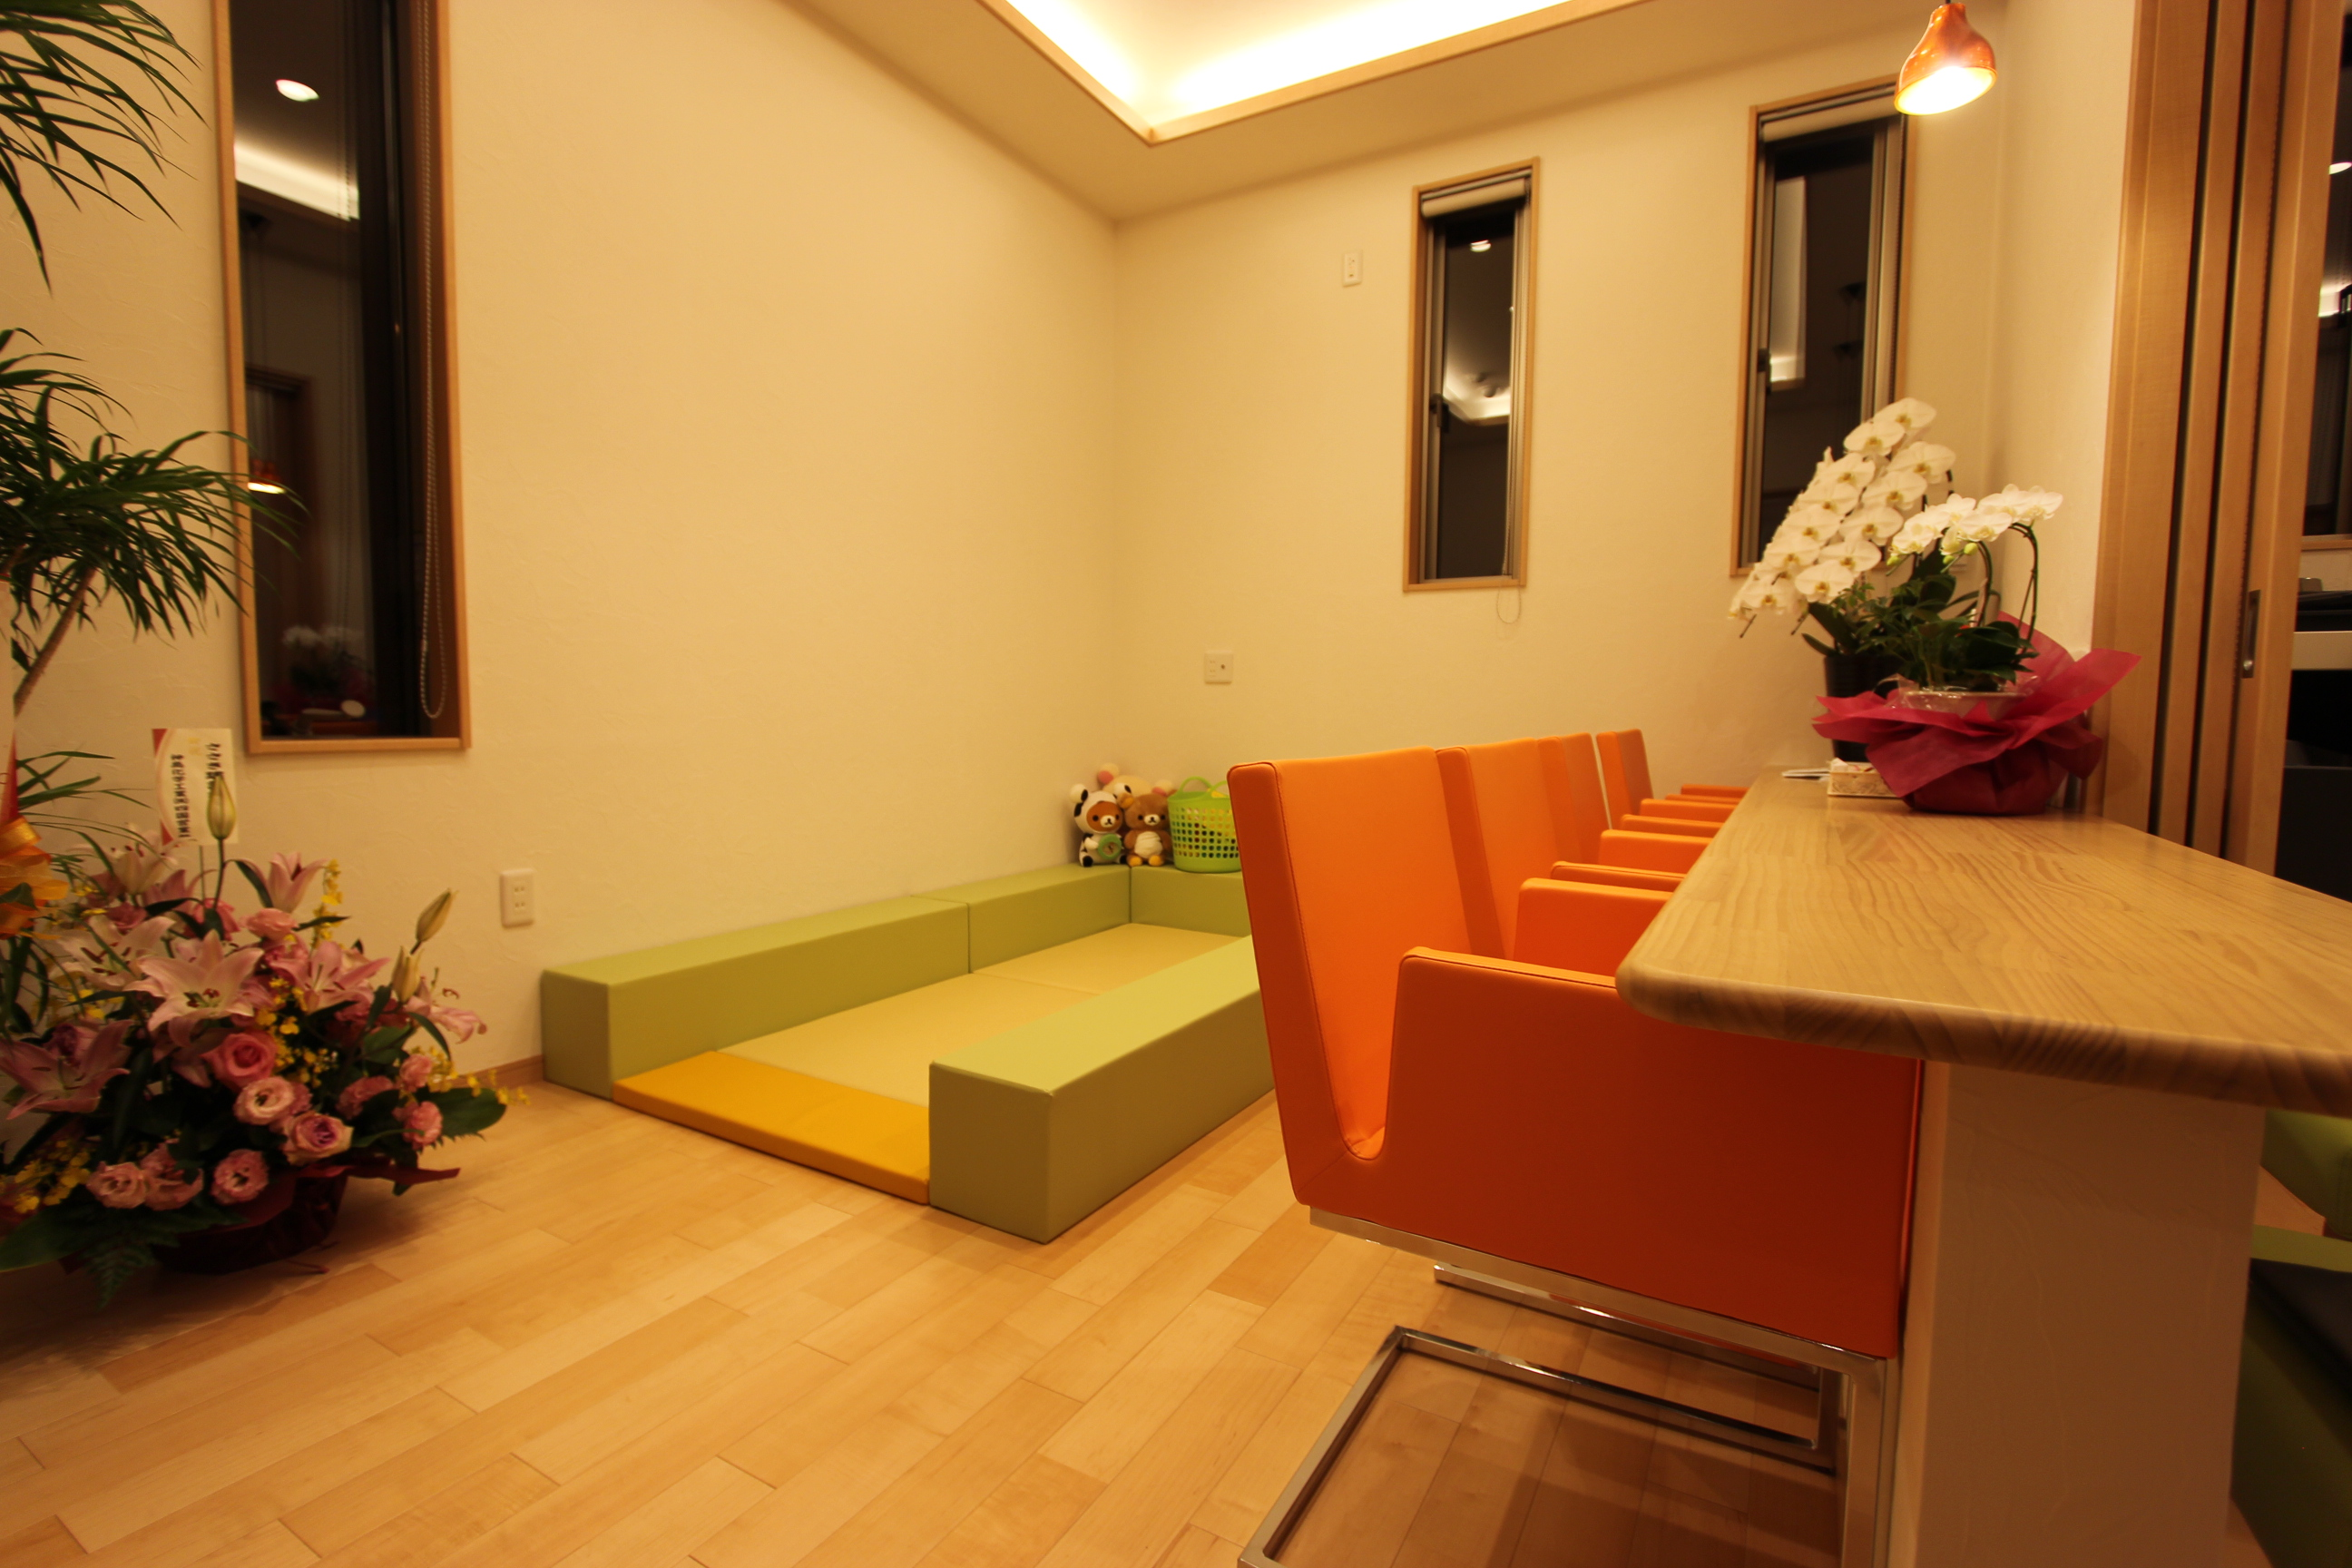 西条市で住宅購入した内装写真